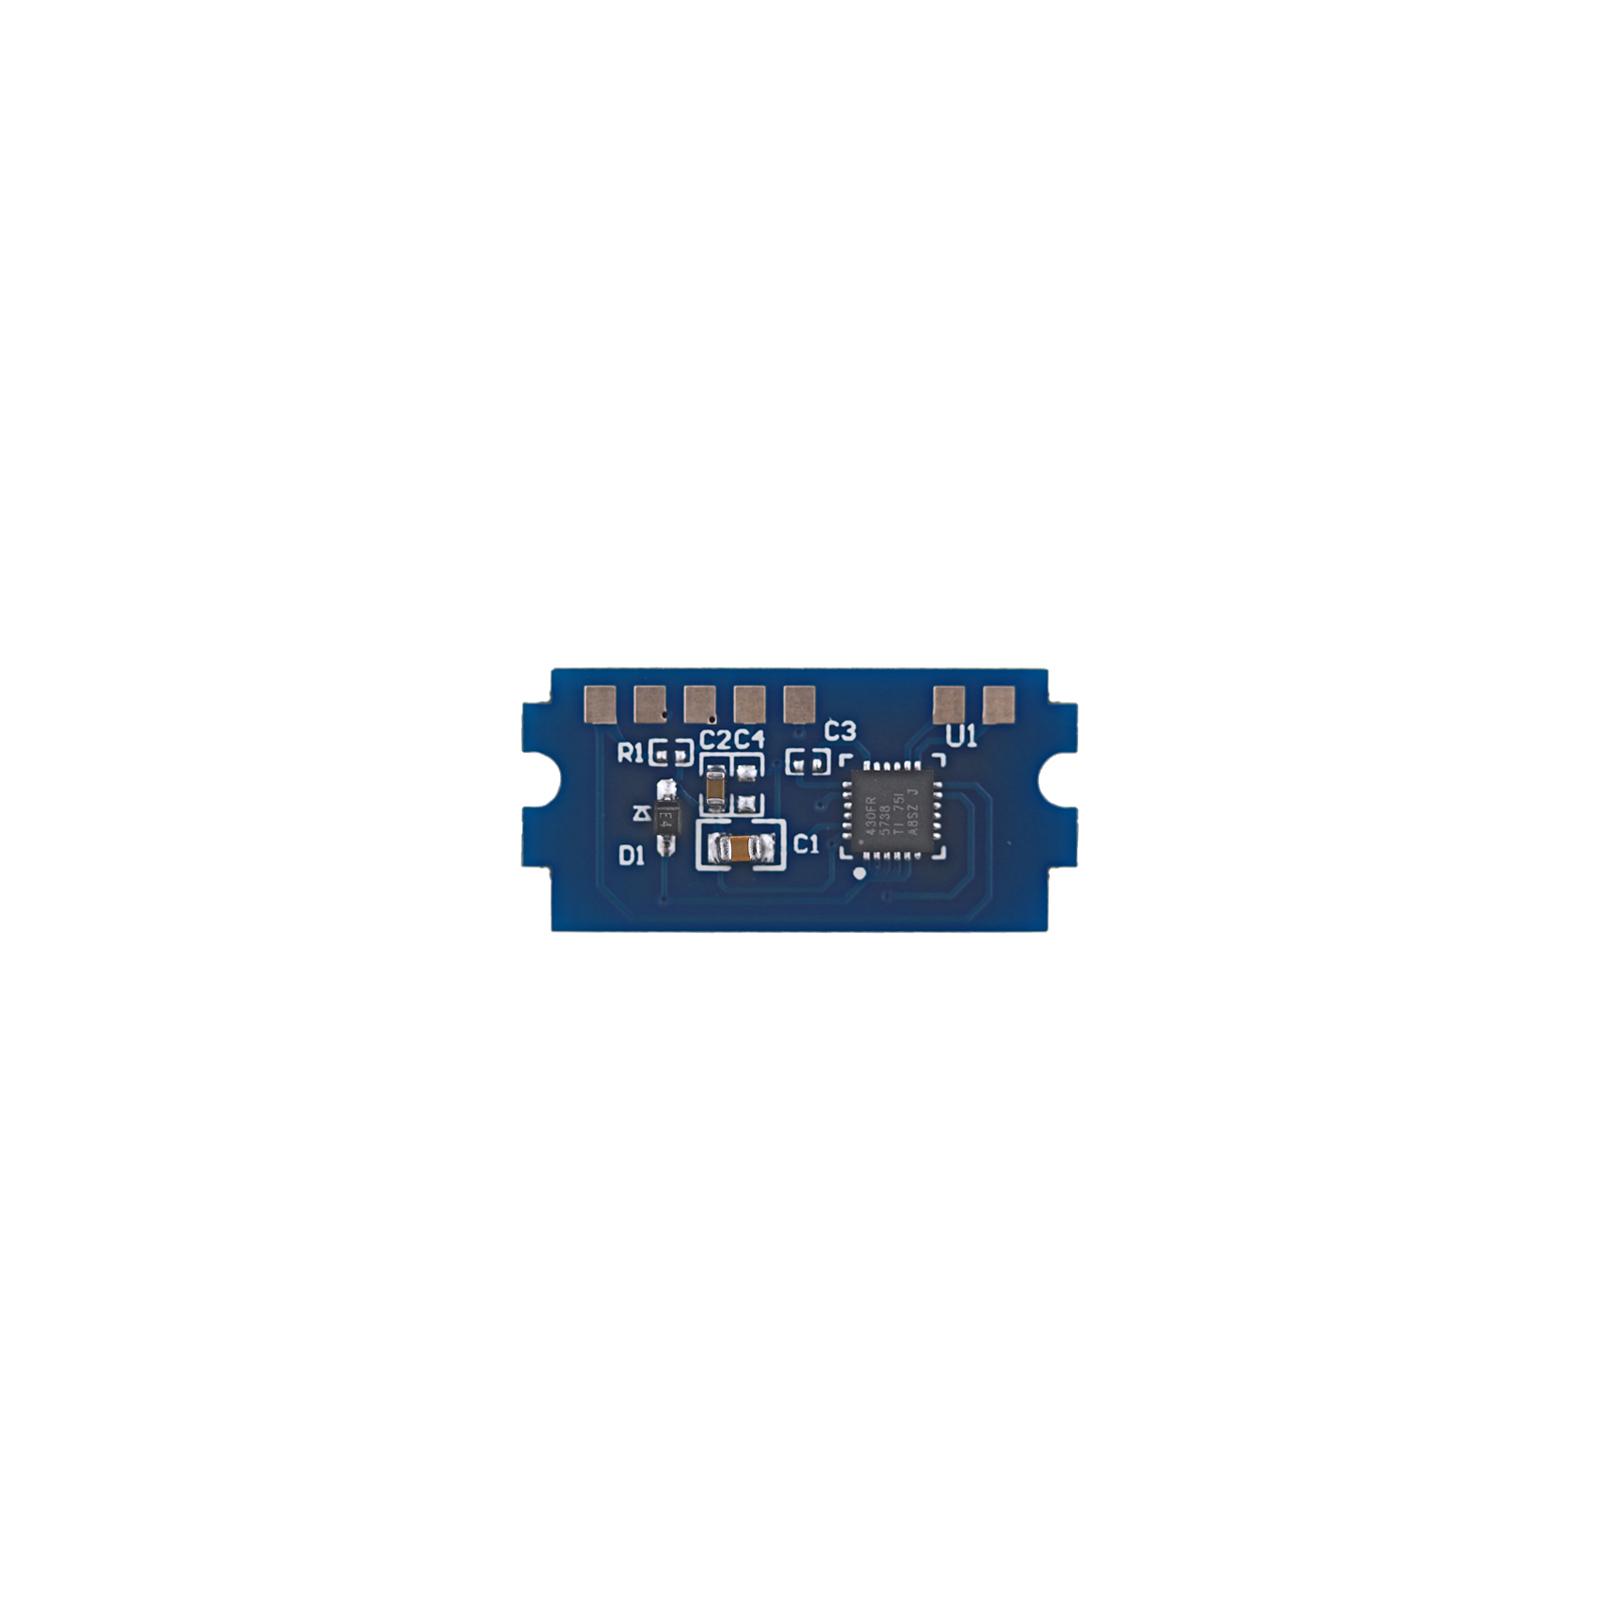 Чип для картриджа Kyocera TK-3170 (EU) 15.5k Static Control (TK3170CP-EU)